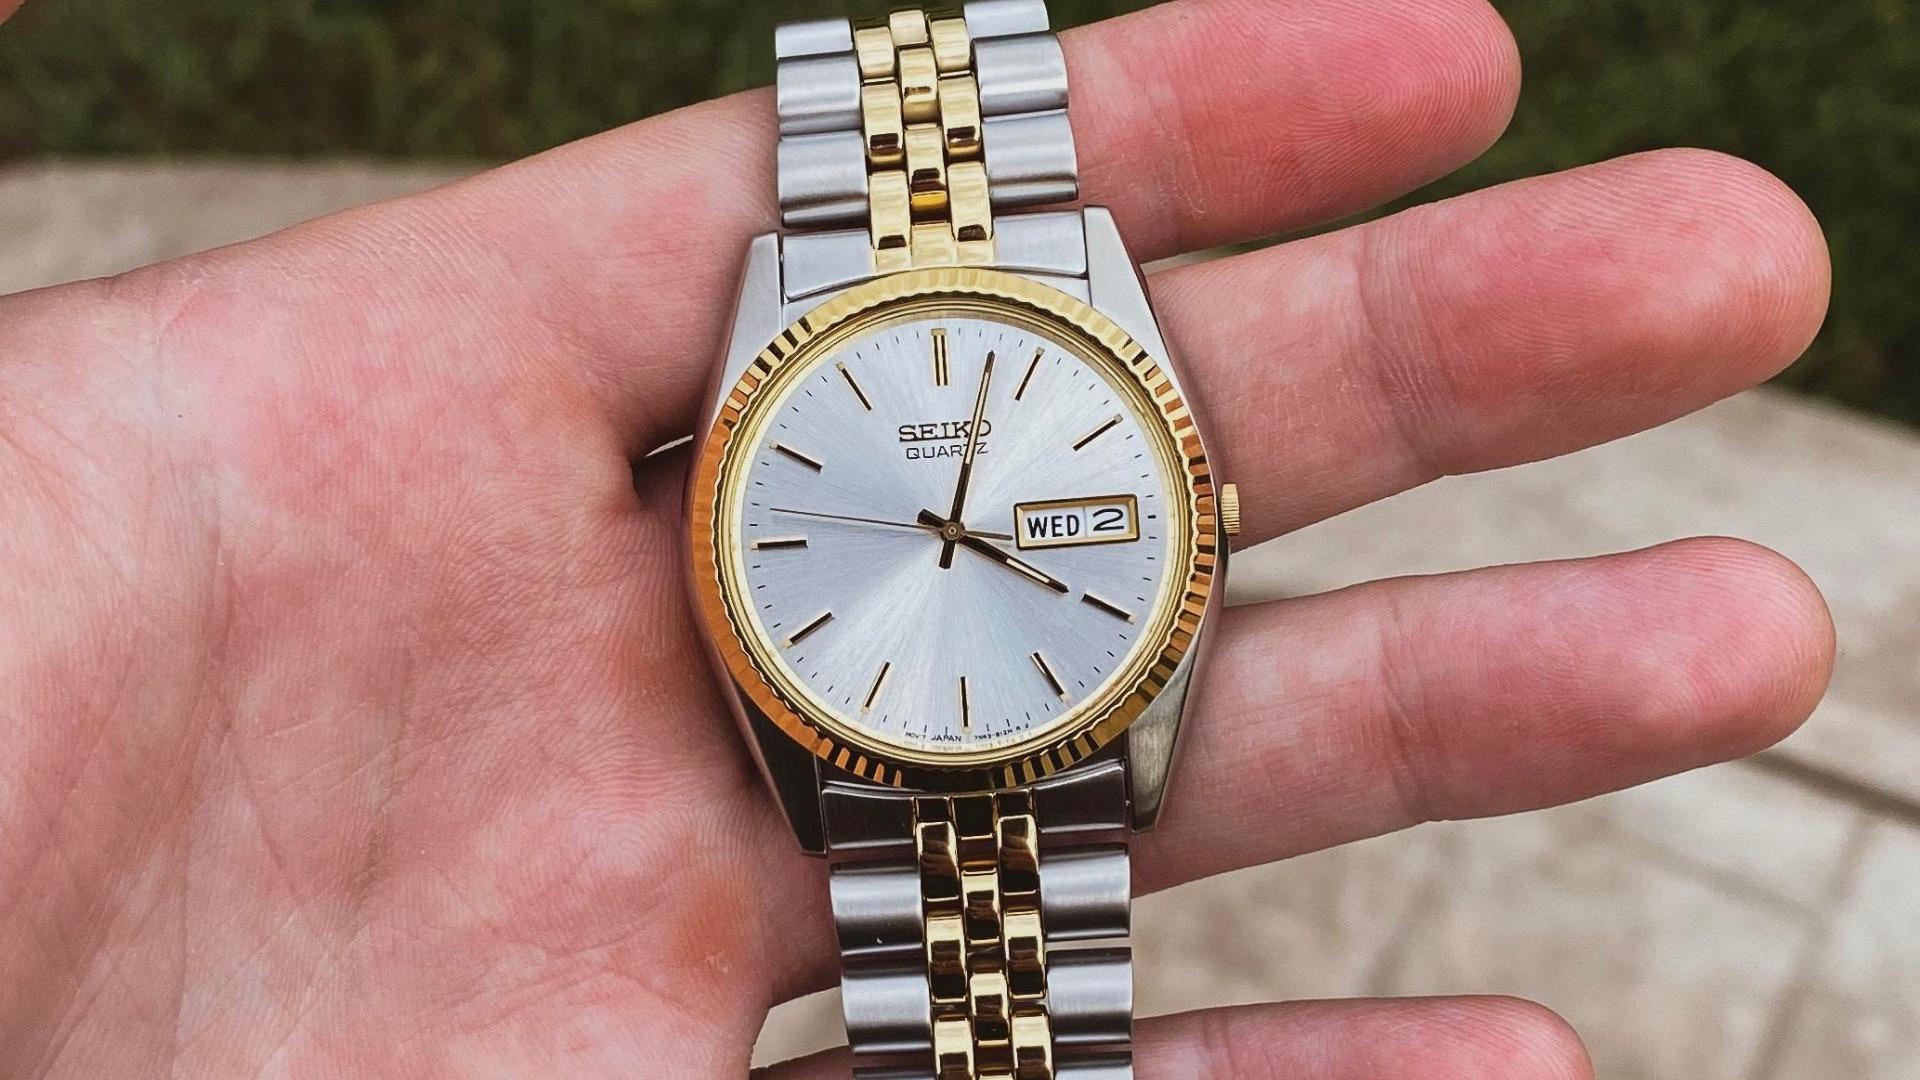 Rolex Datejust alternatives hero image